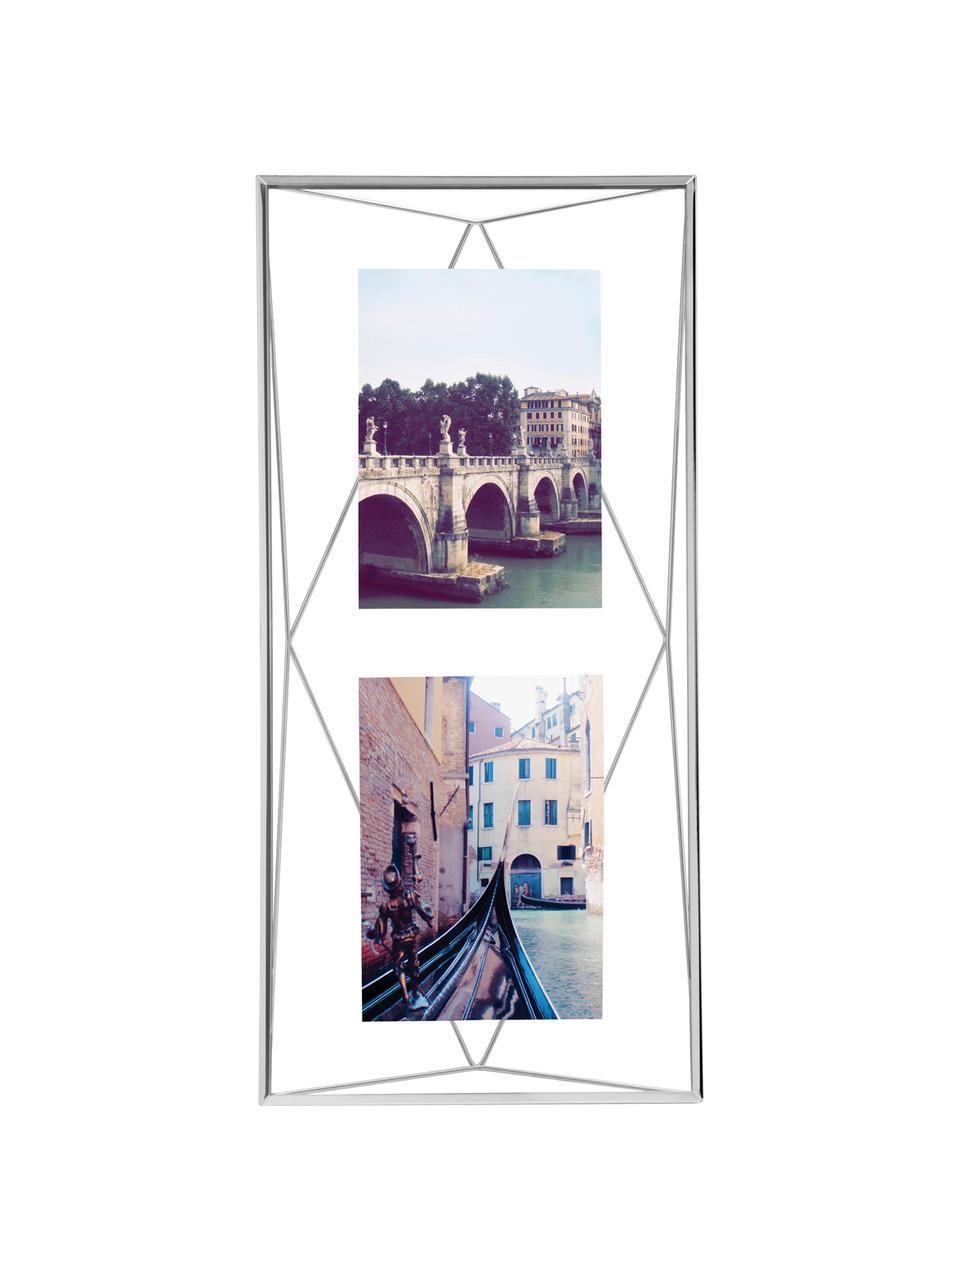 Bilderrahmen Prisma, Rahmen: Stahl, verchromt, Front: Glas, Chrom, 13 x 18 cm